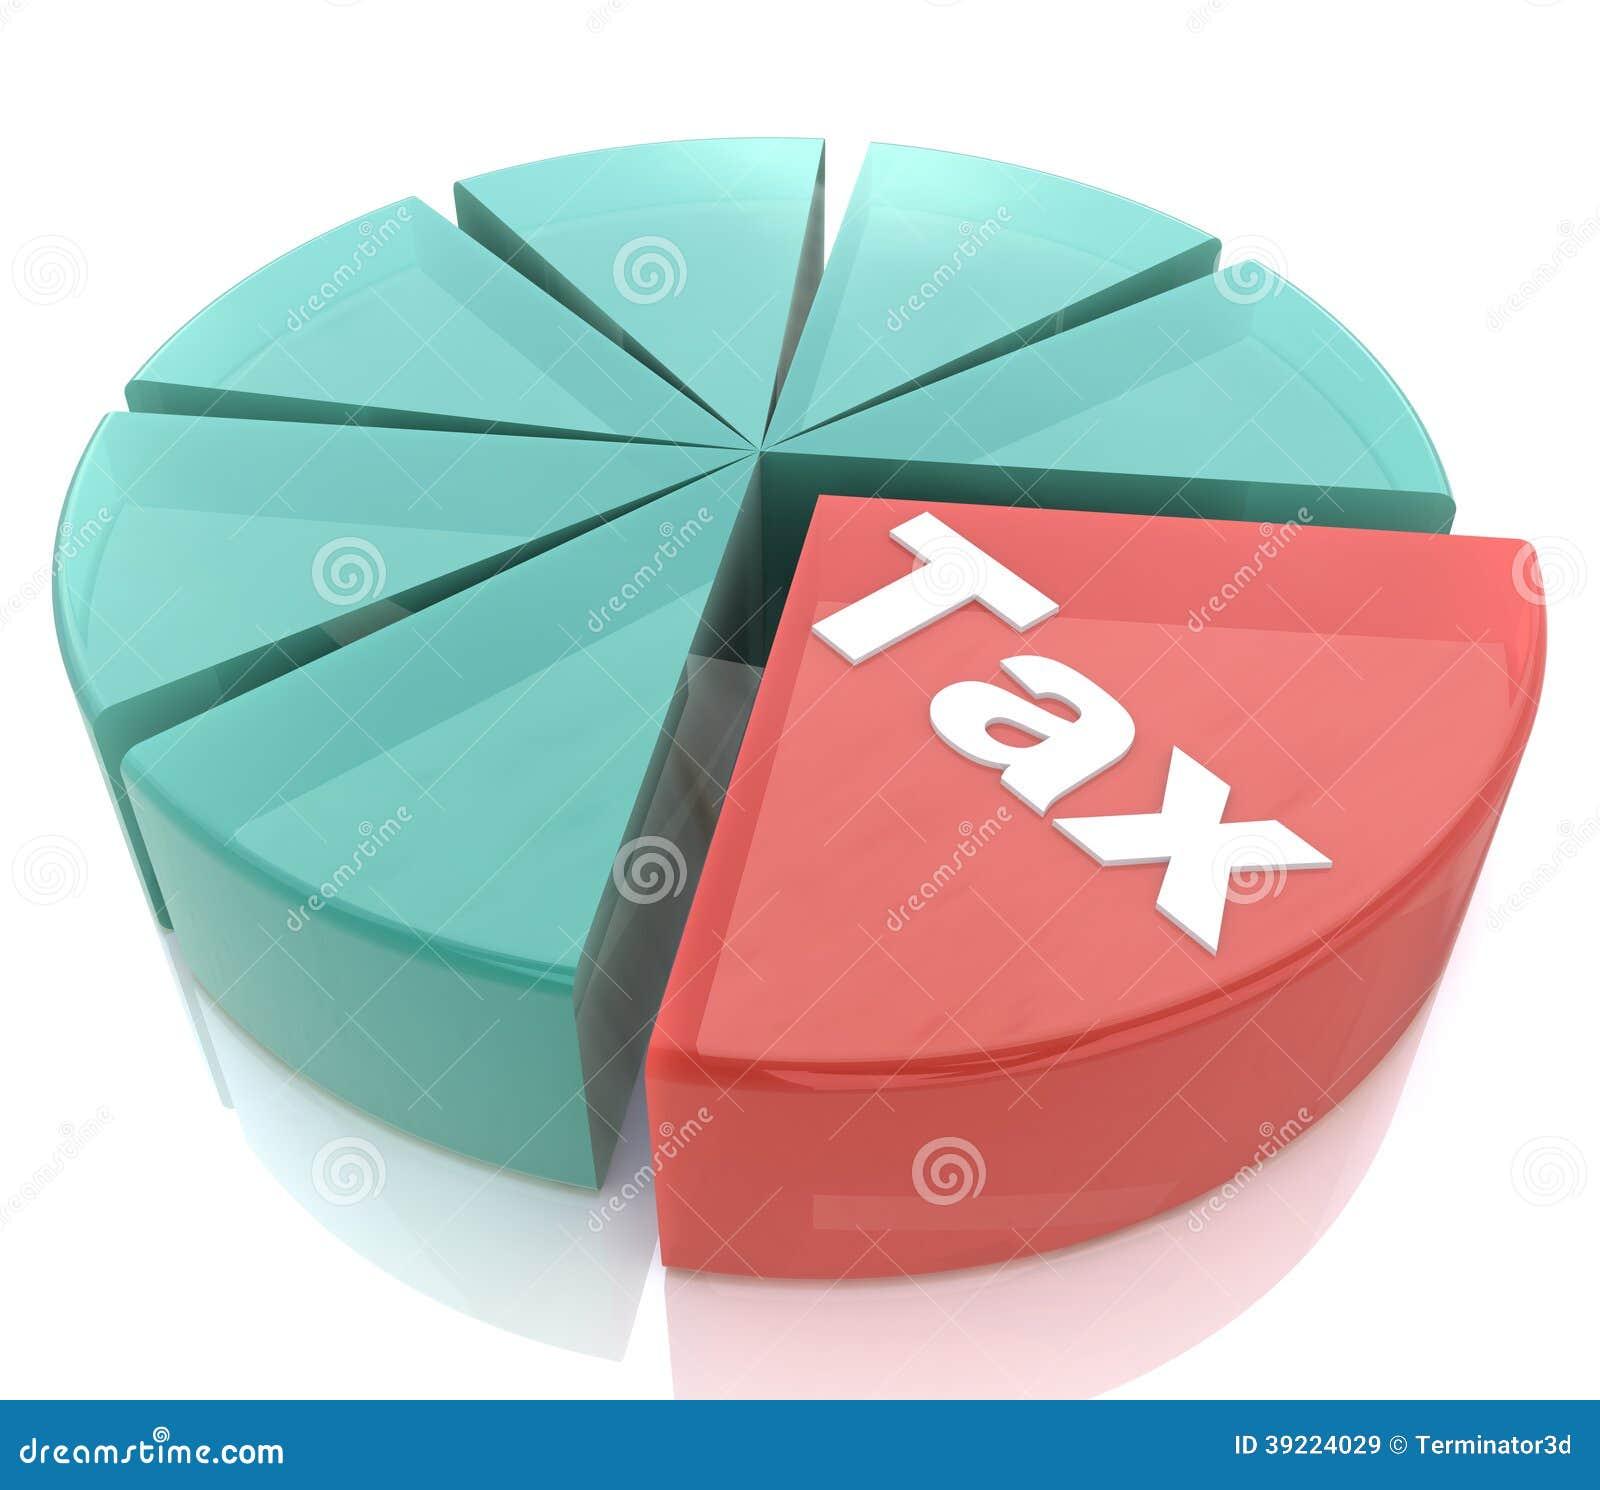 Carta de torta do imposto